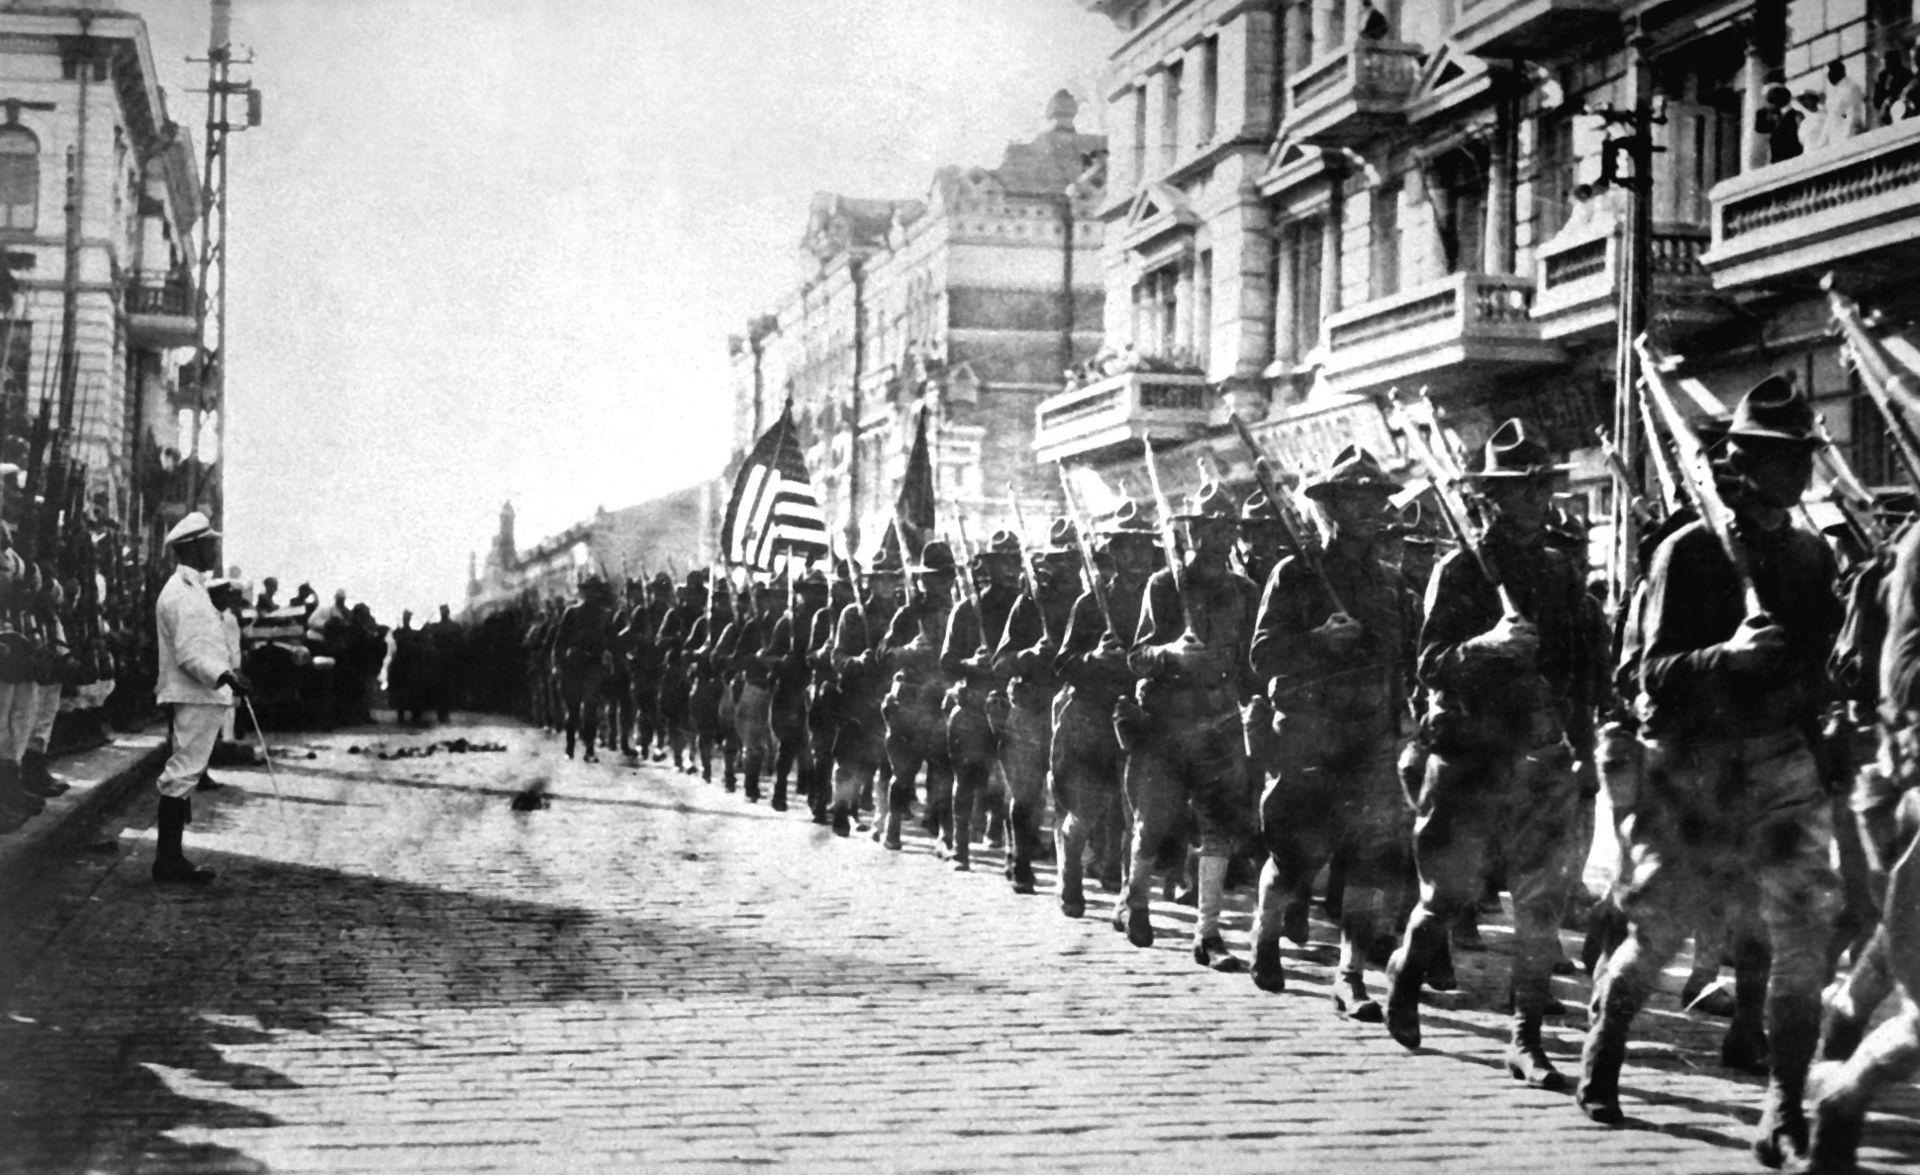 american_troops_in_vladivostok_1918_hd-sn-99-02013-jpeg